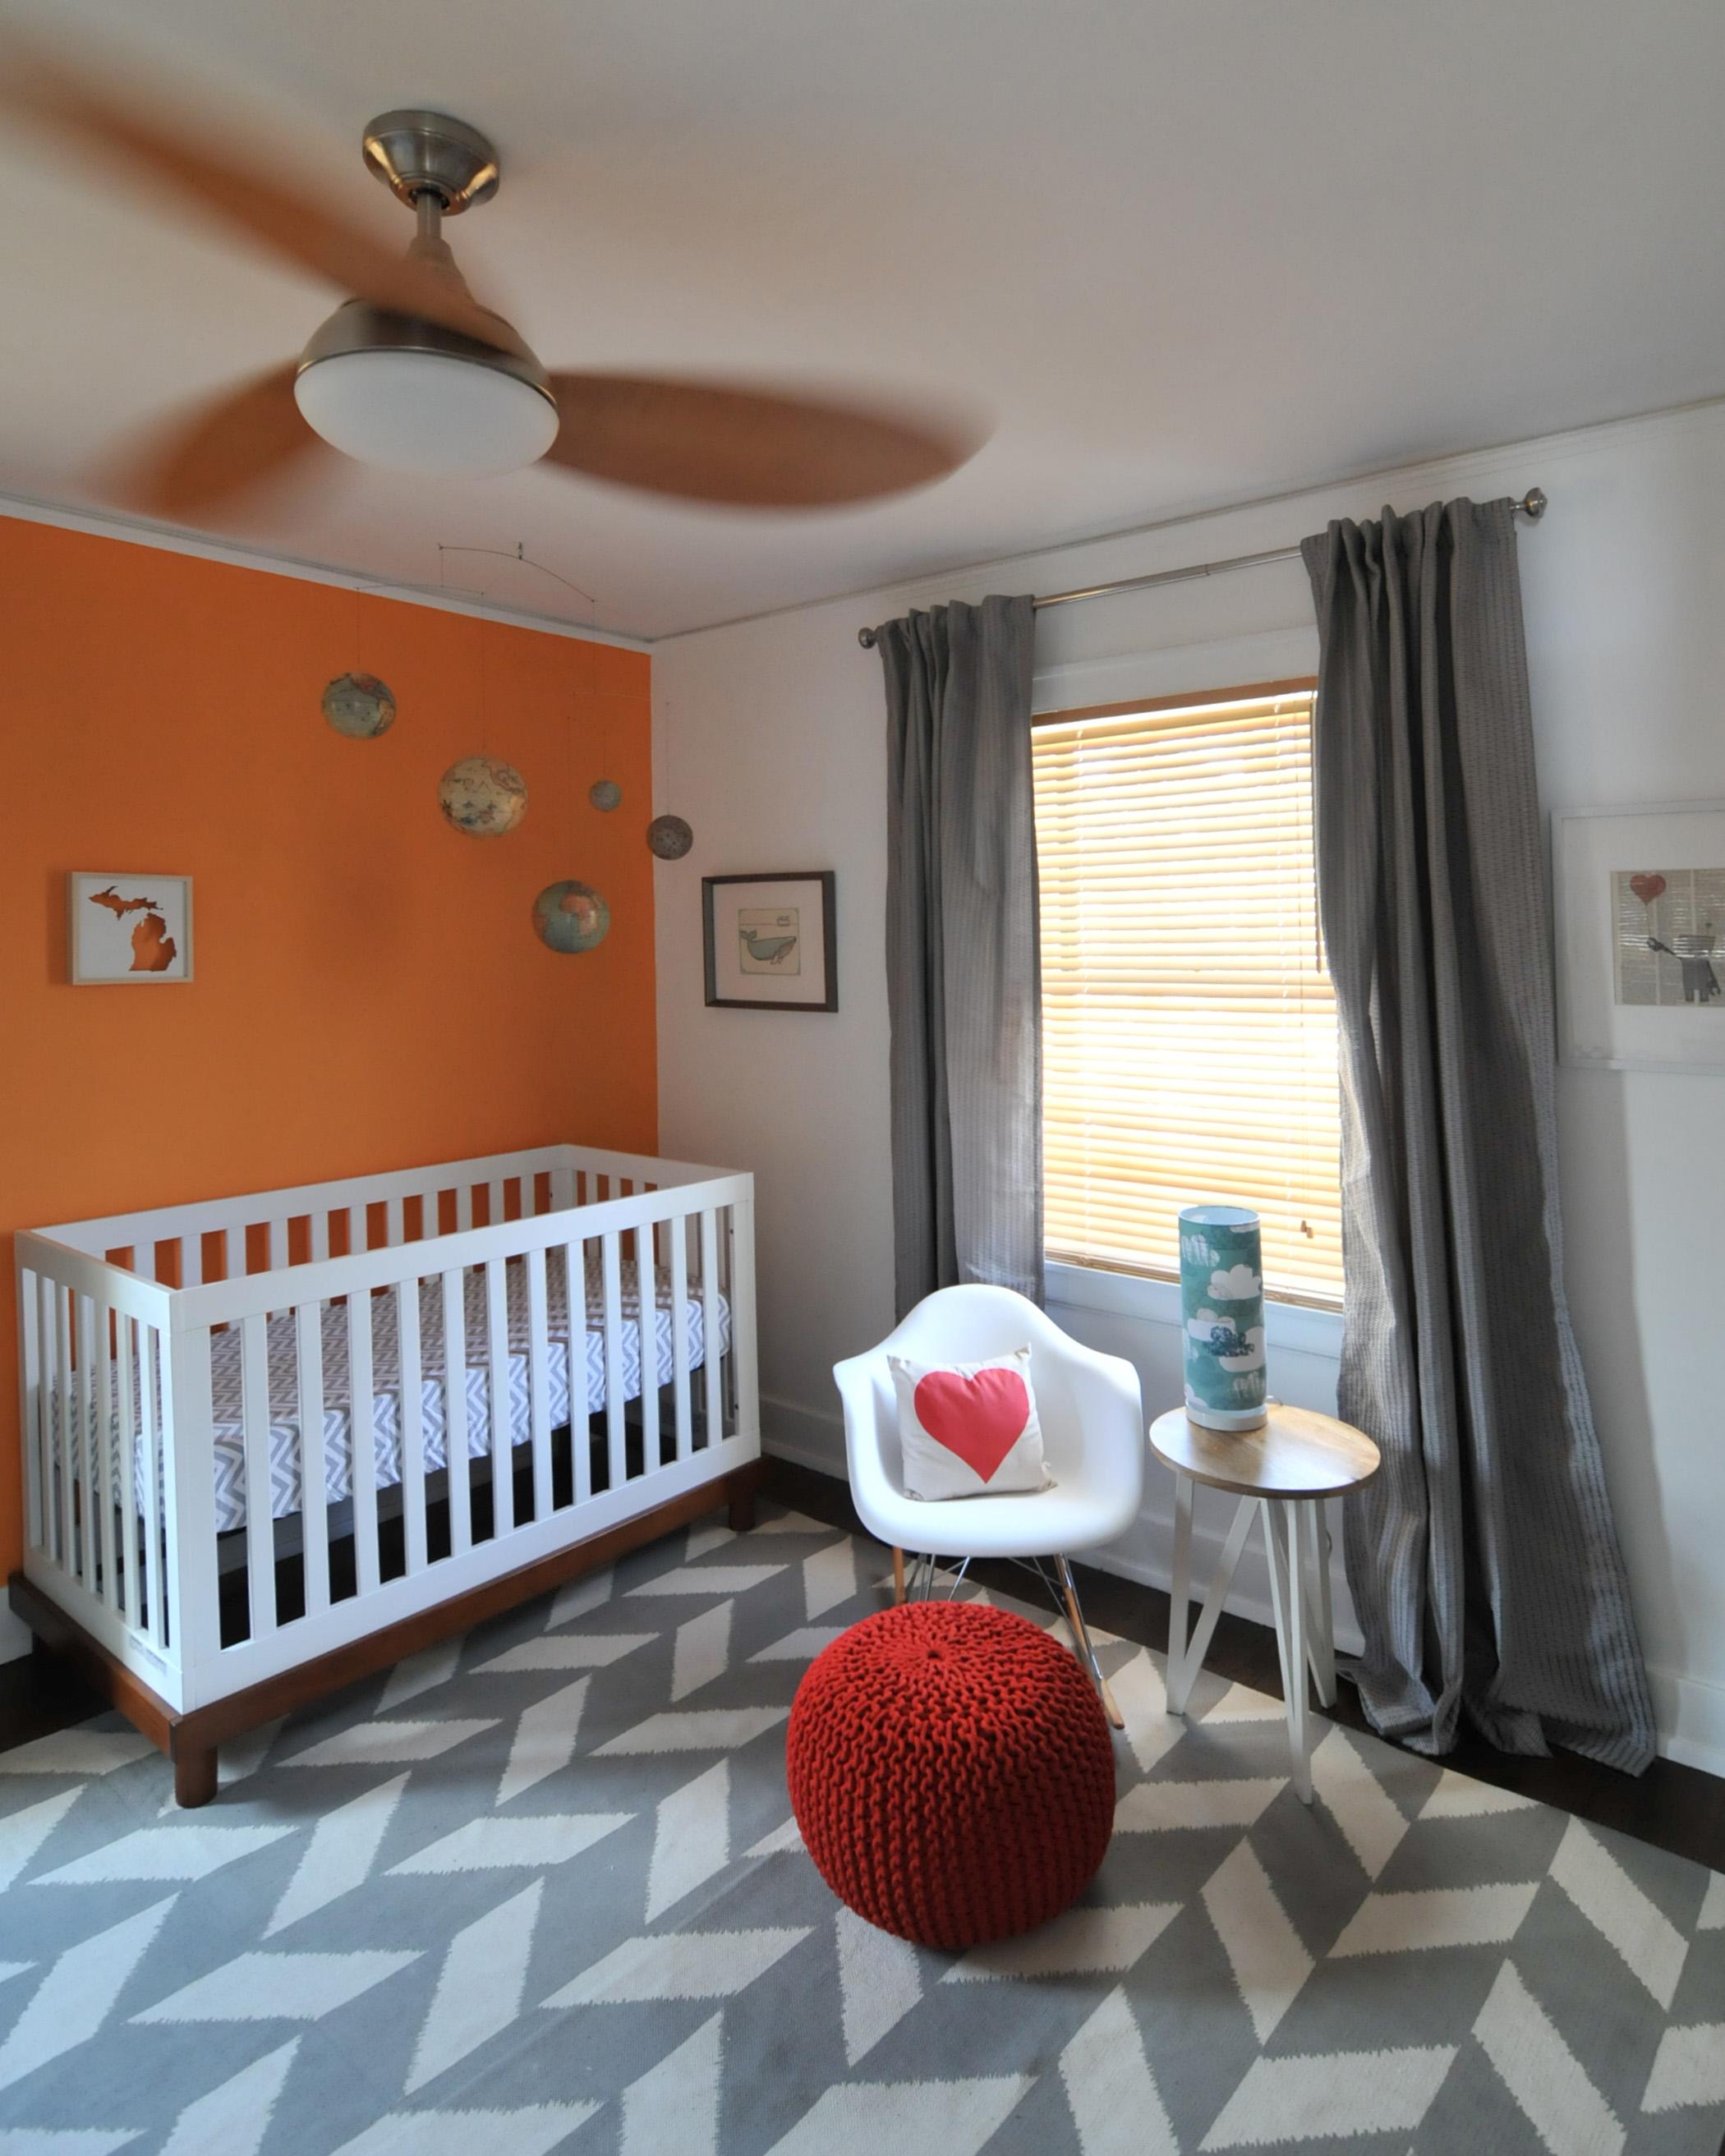 Cool Baby Mod Cribs Design - HomesFeed